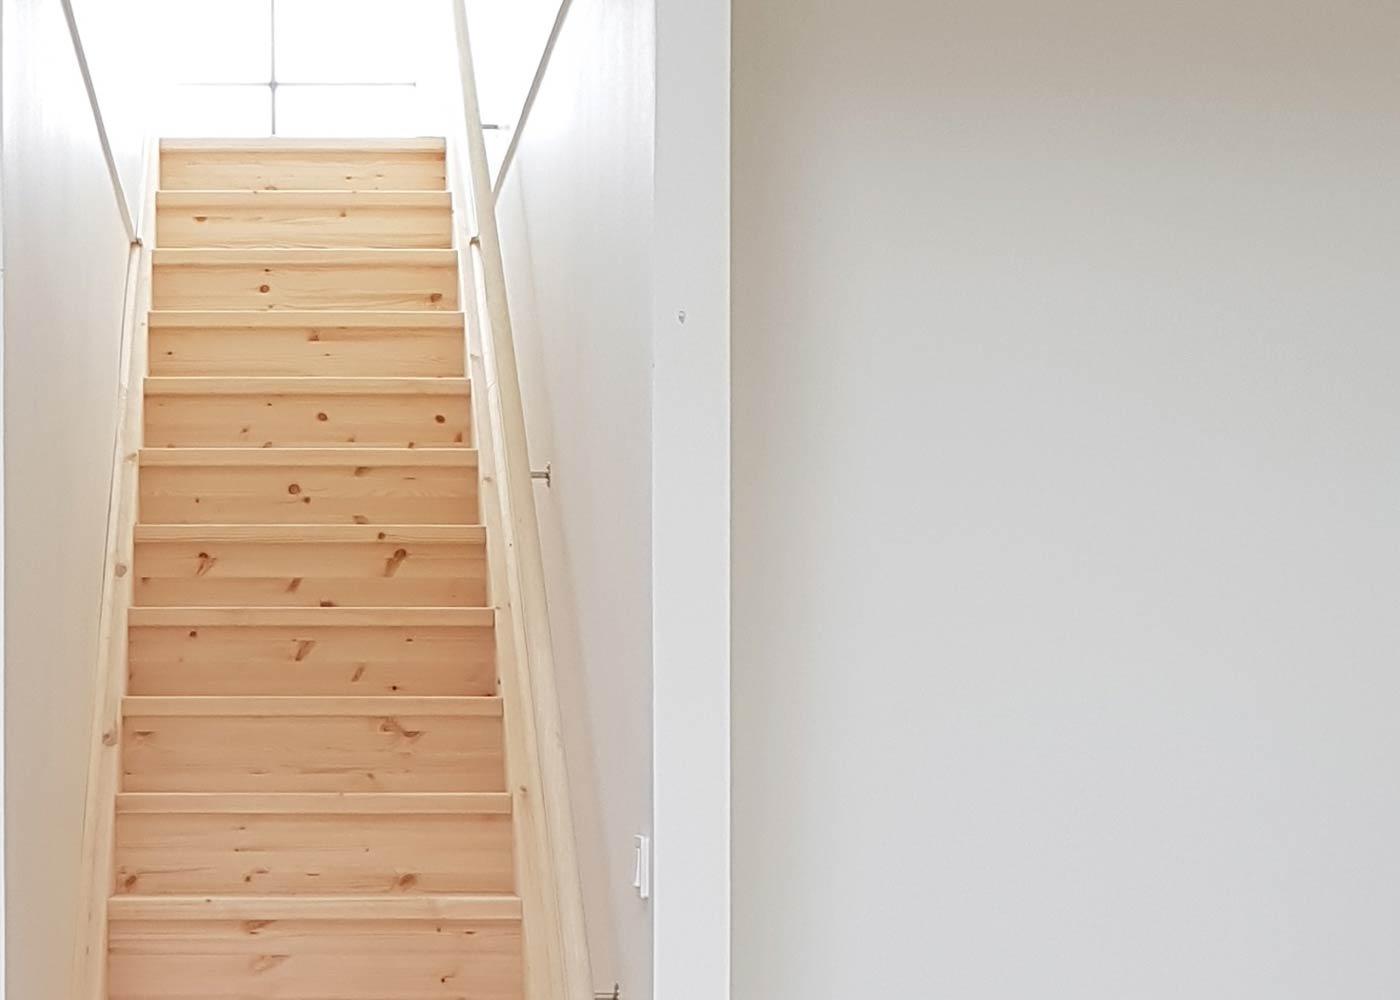 raktrappa -trapptillverkaren trappor